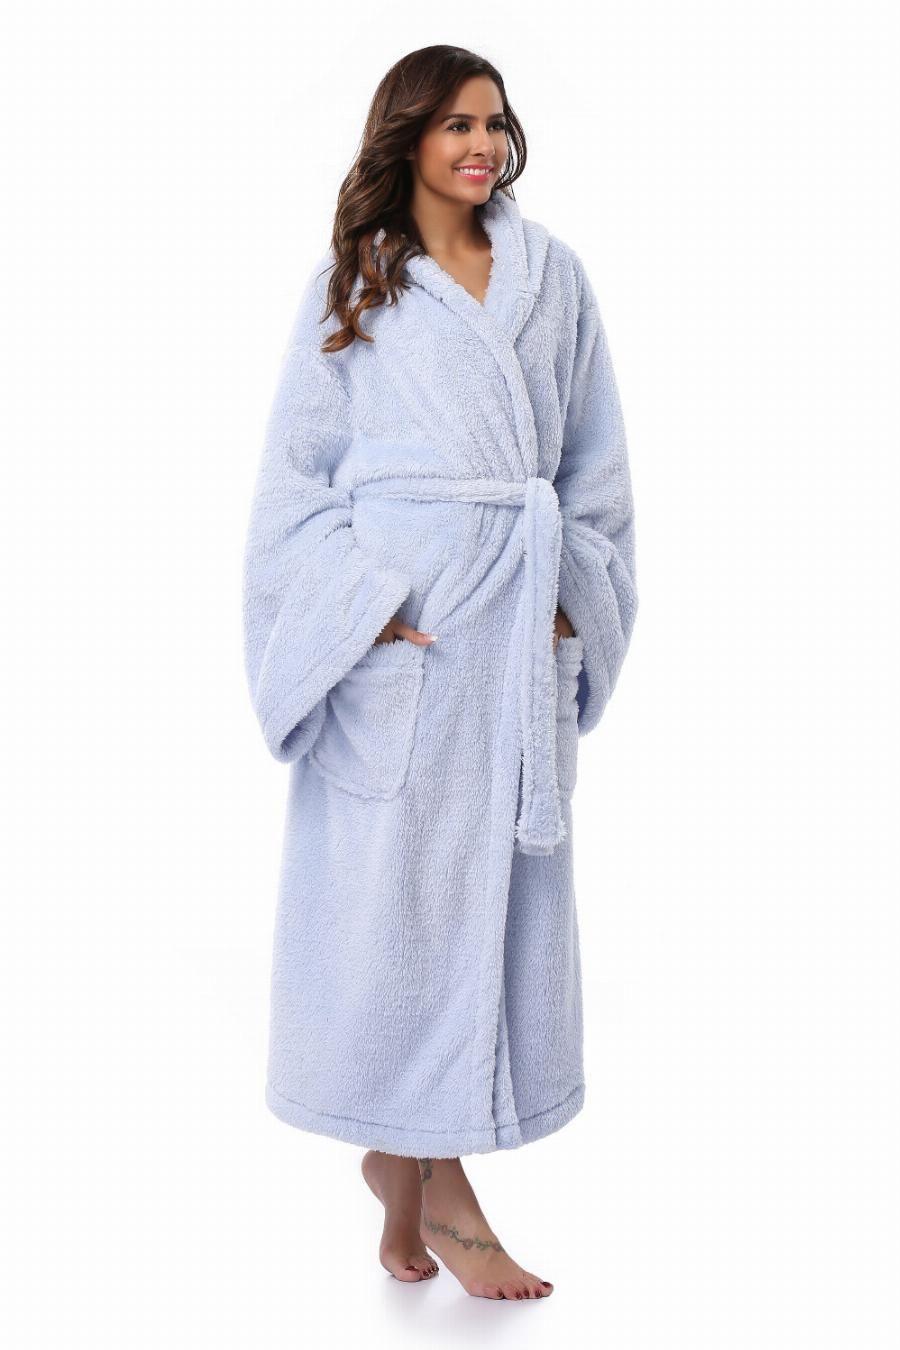 5b3f3c870b Winter Thick Warm Women Robes 2017 Coral Fleece Sleepwear Long Robe Woman  Hotel Spa Plush Long Hooded Bathrobe Nightgown Kimono